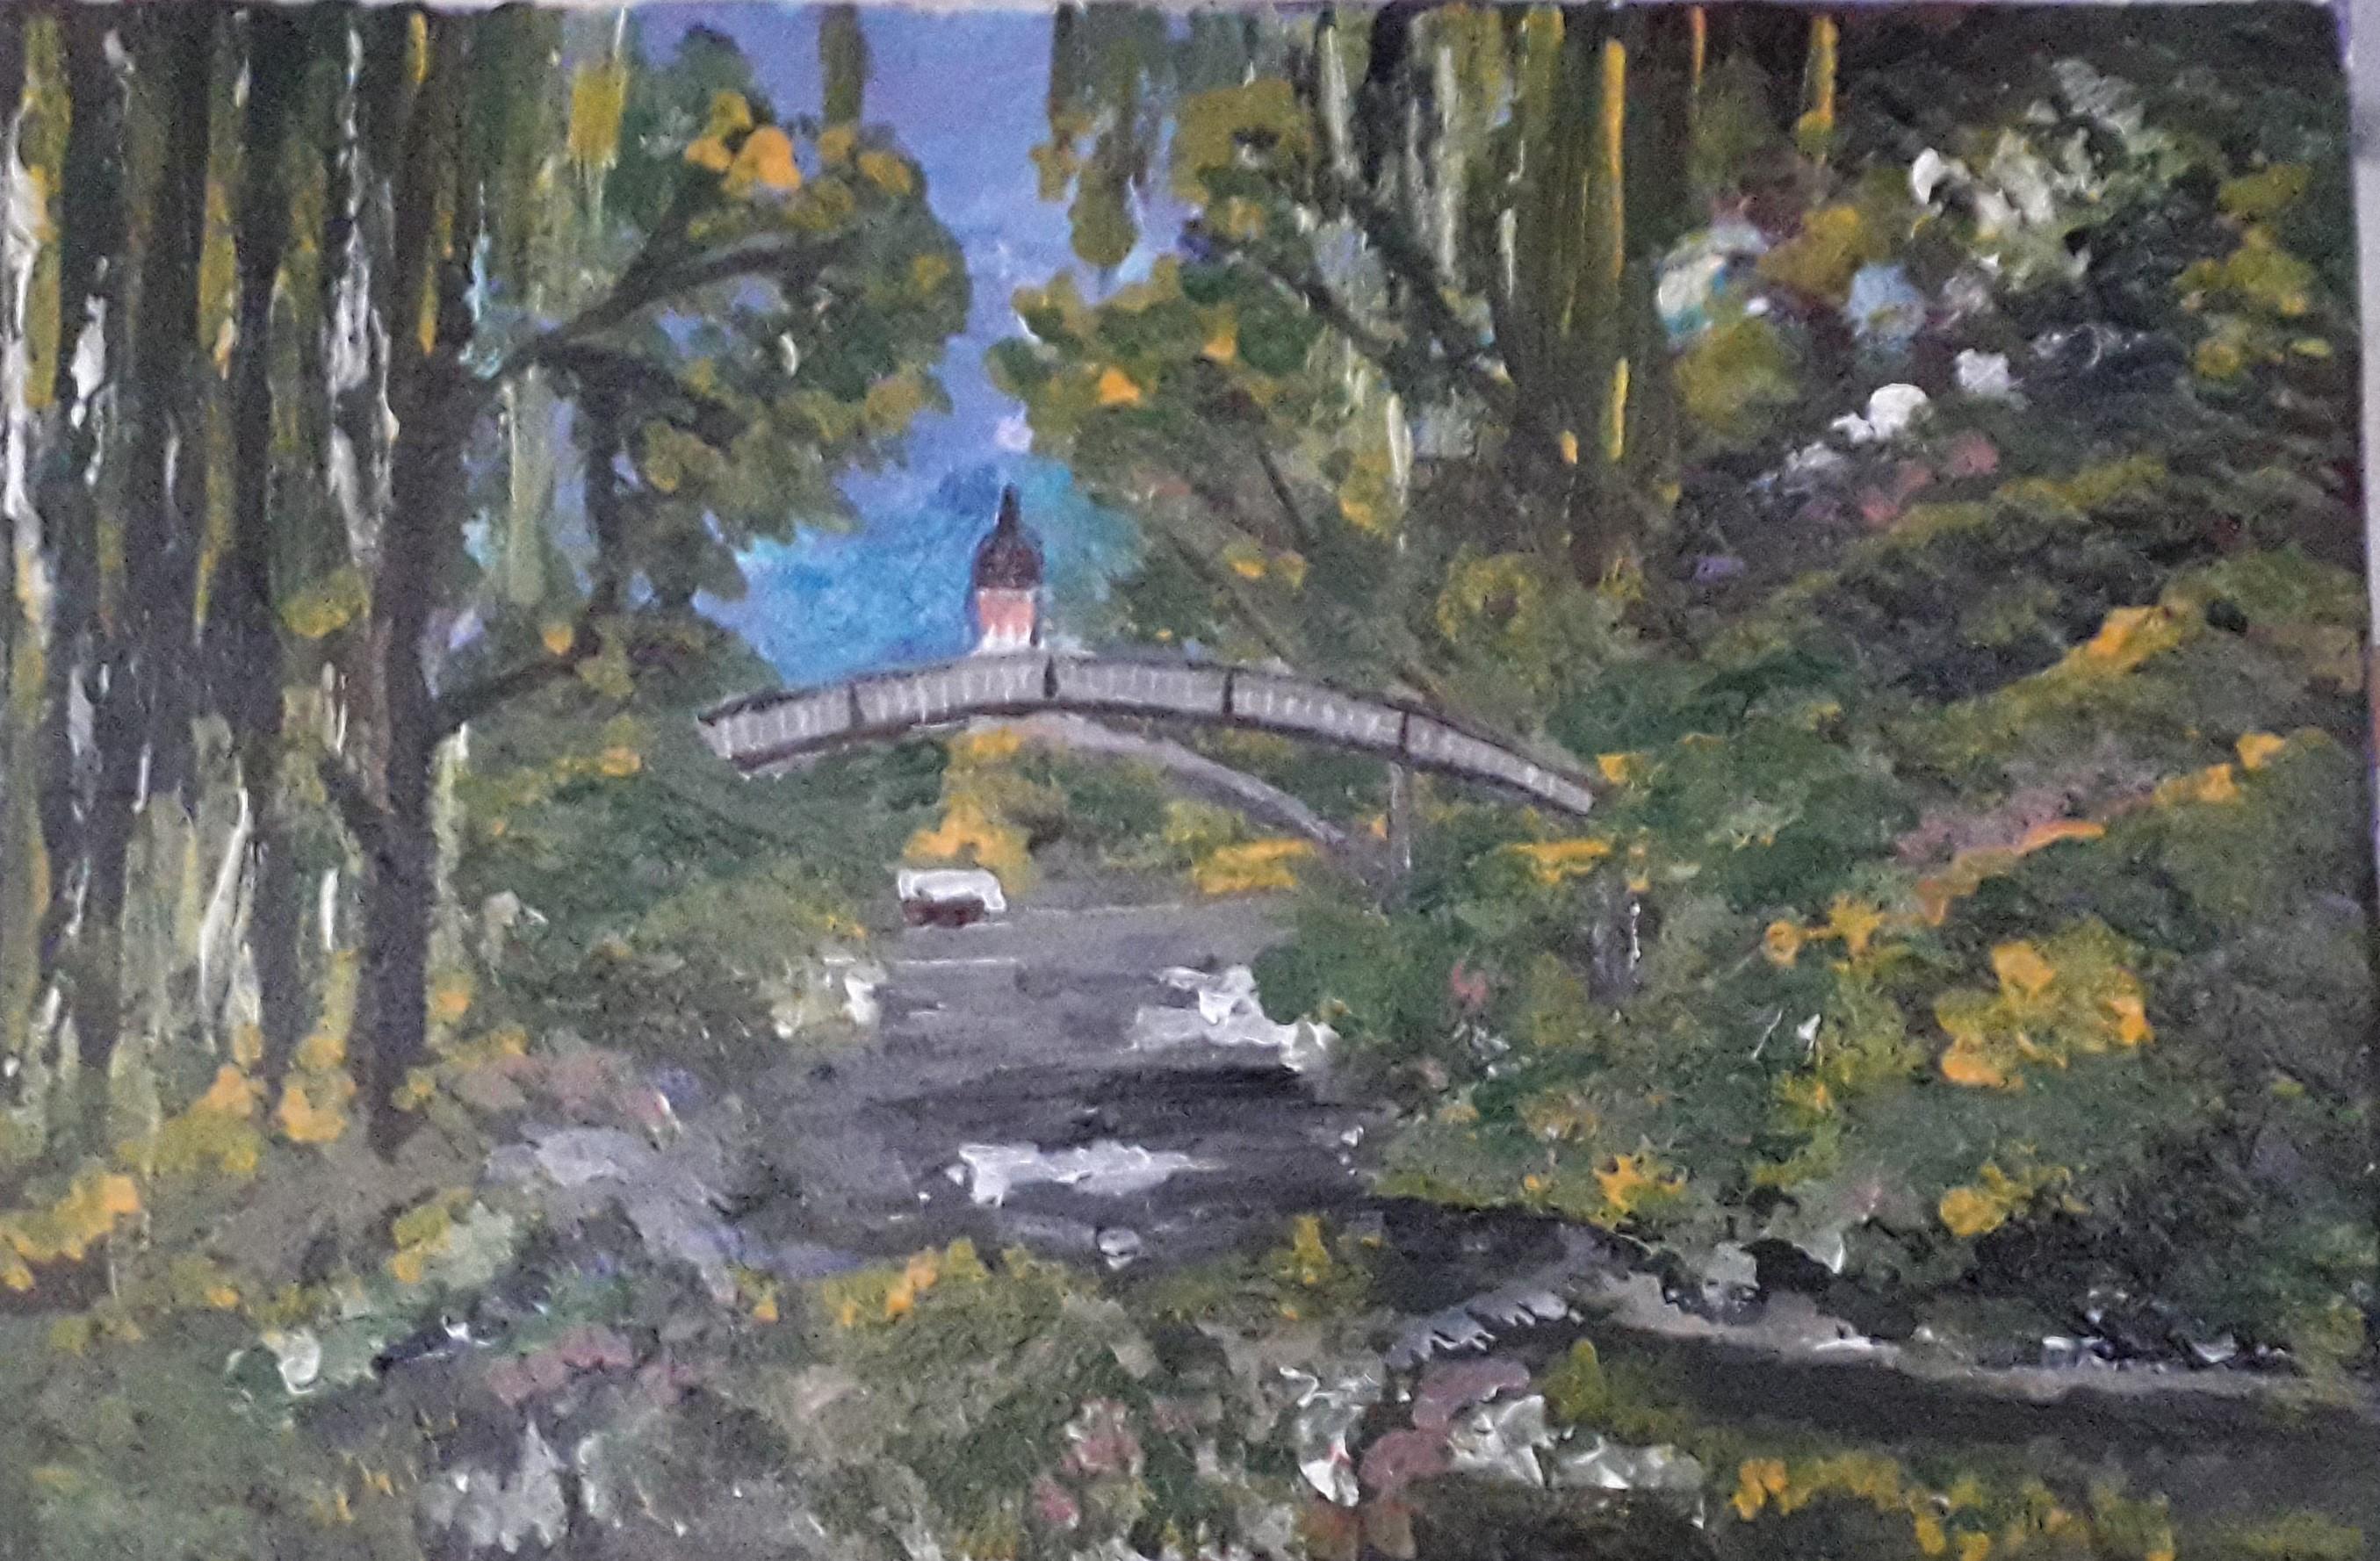 River and Walk Way - Frankfurt by Simpson David